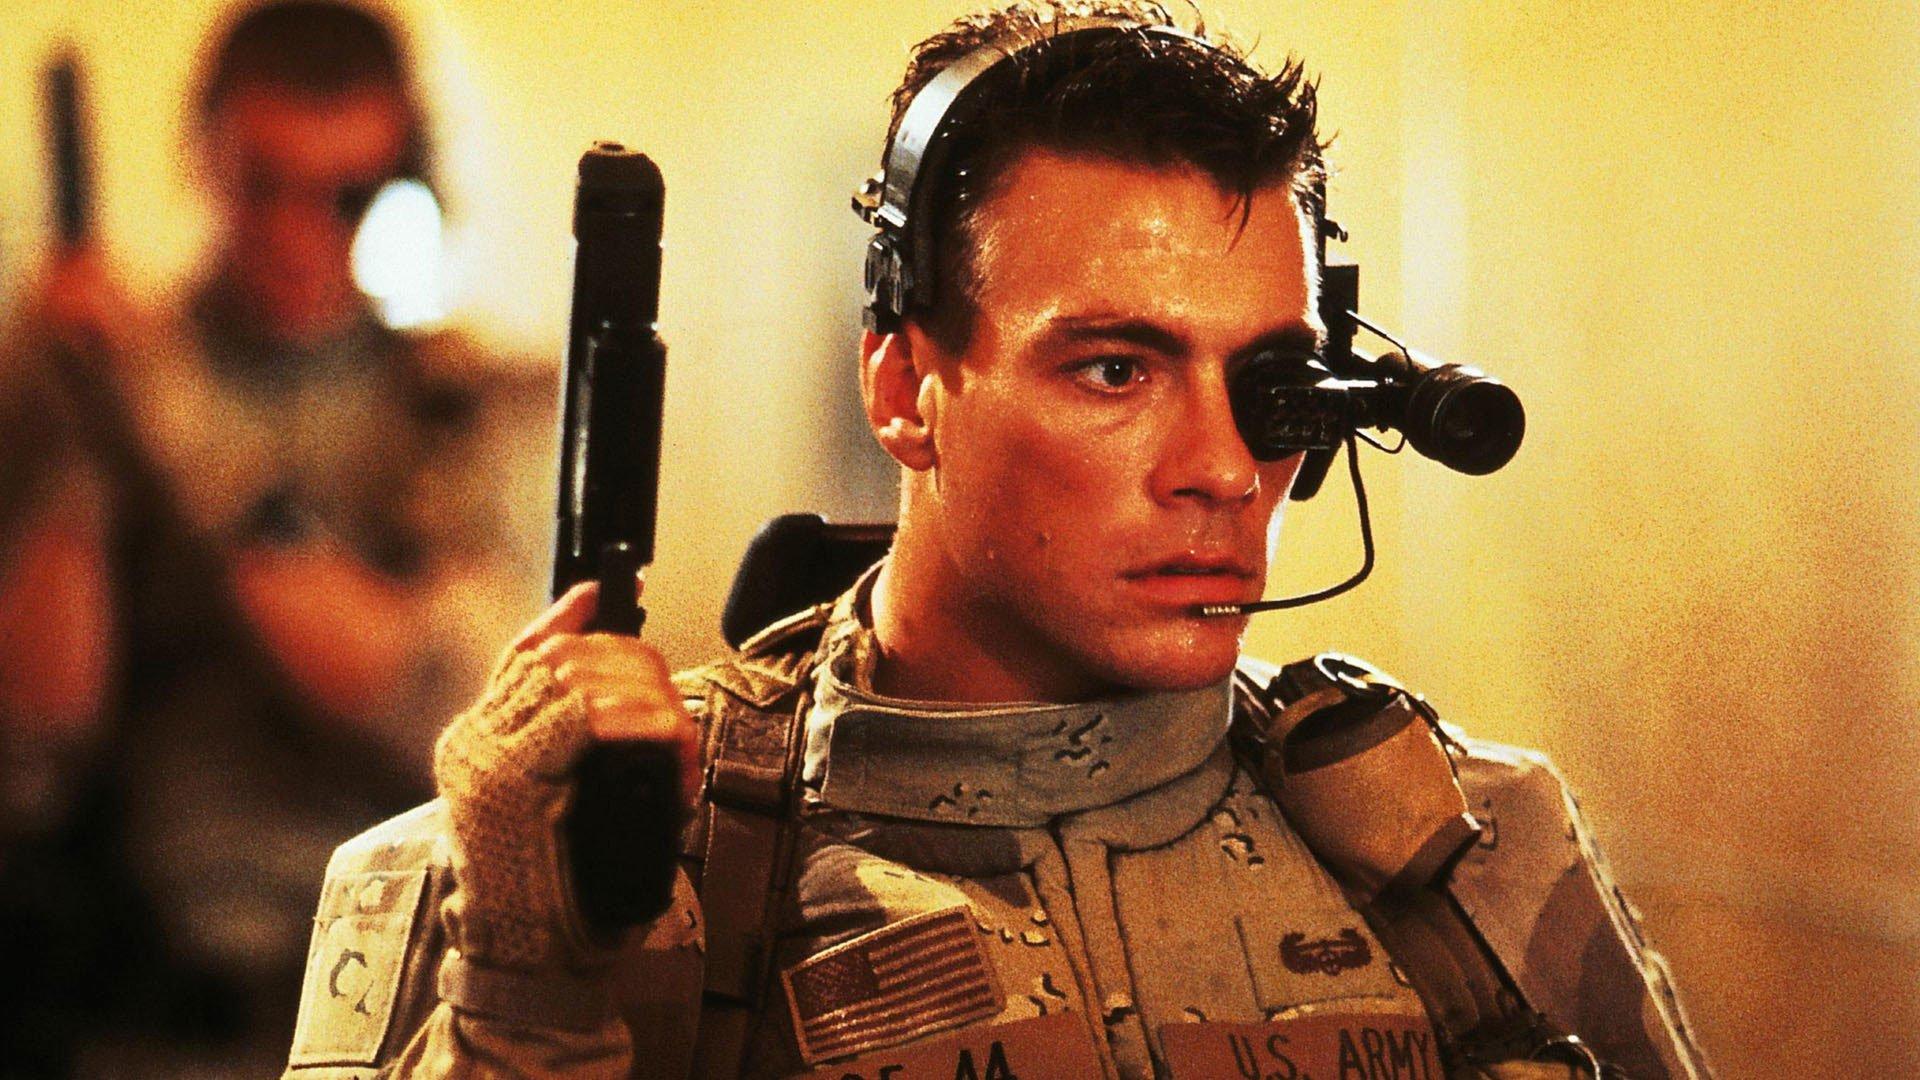 Movie - Universal Soldier  Jean-claude Van Damme Wallpaper